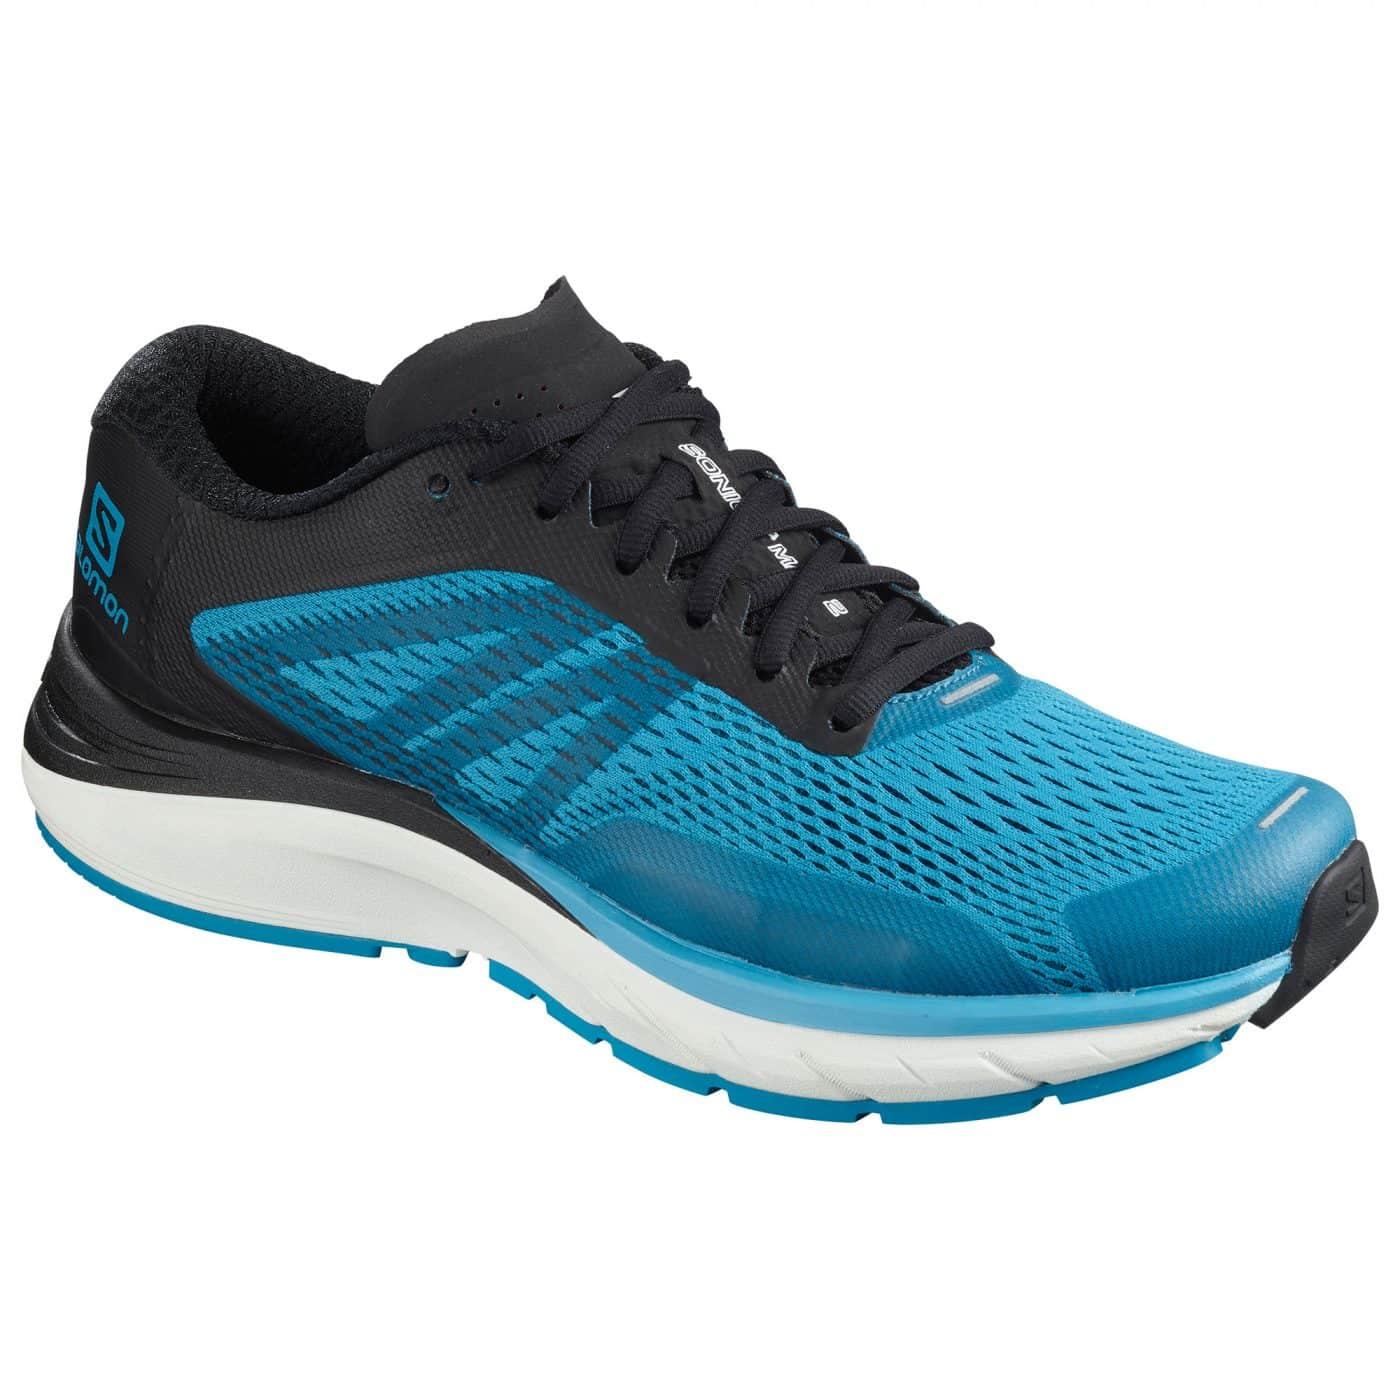 chaussures-running-salomon-sonic-ra-max-2-homme